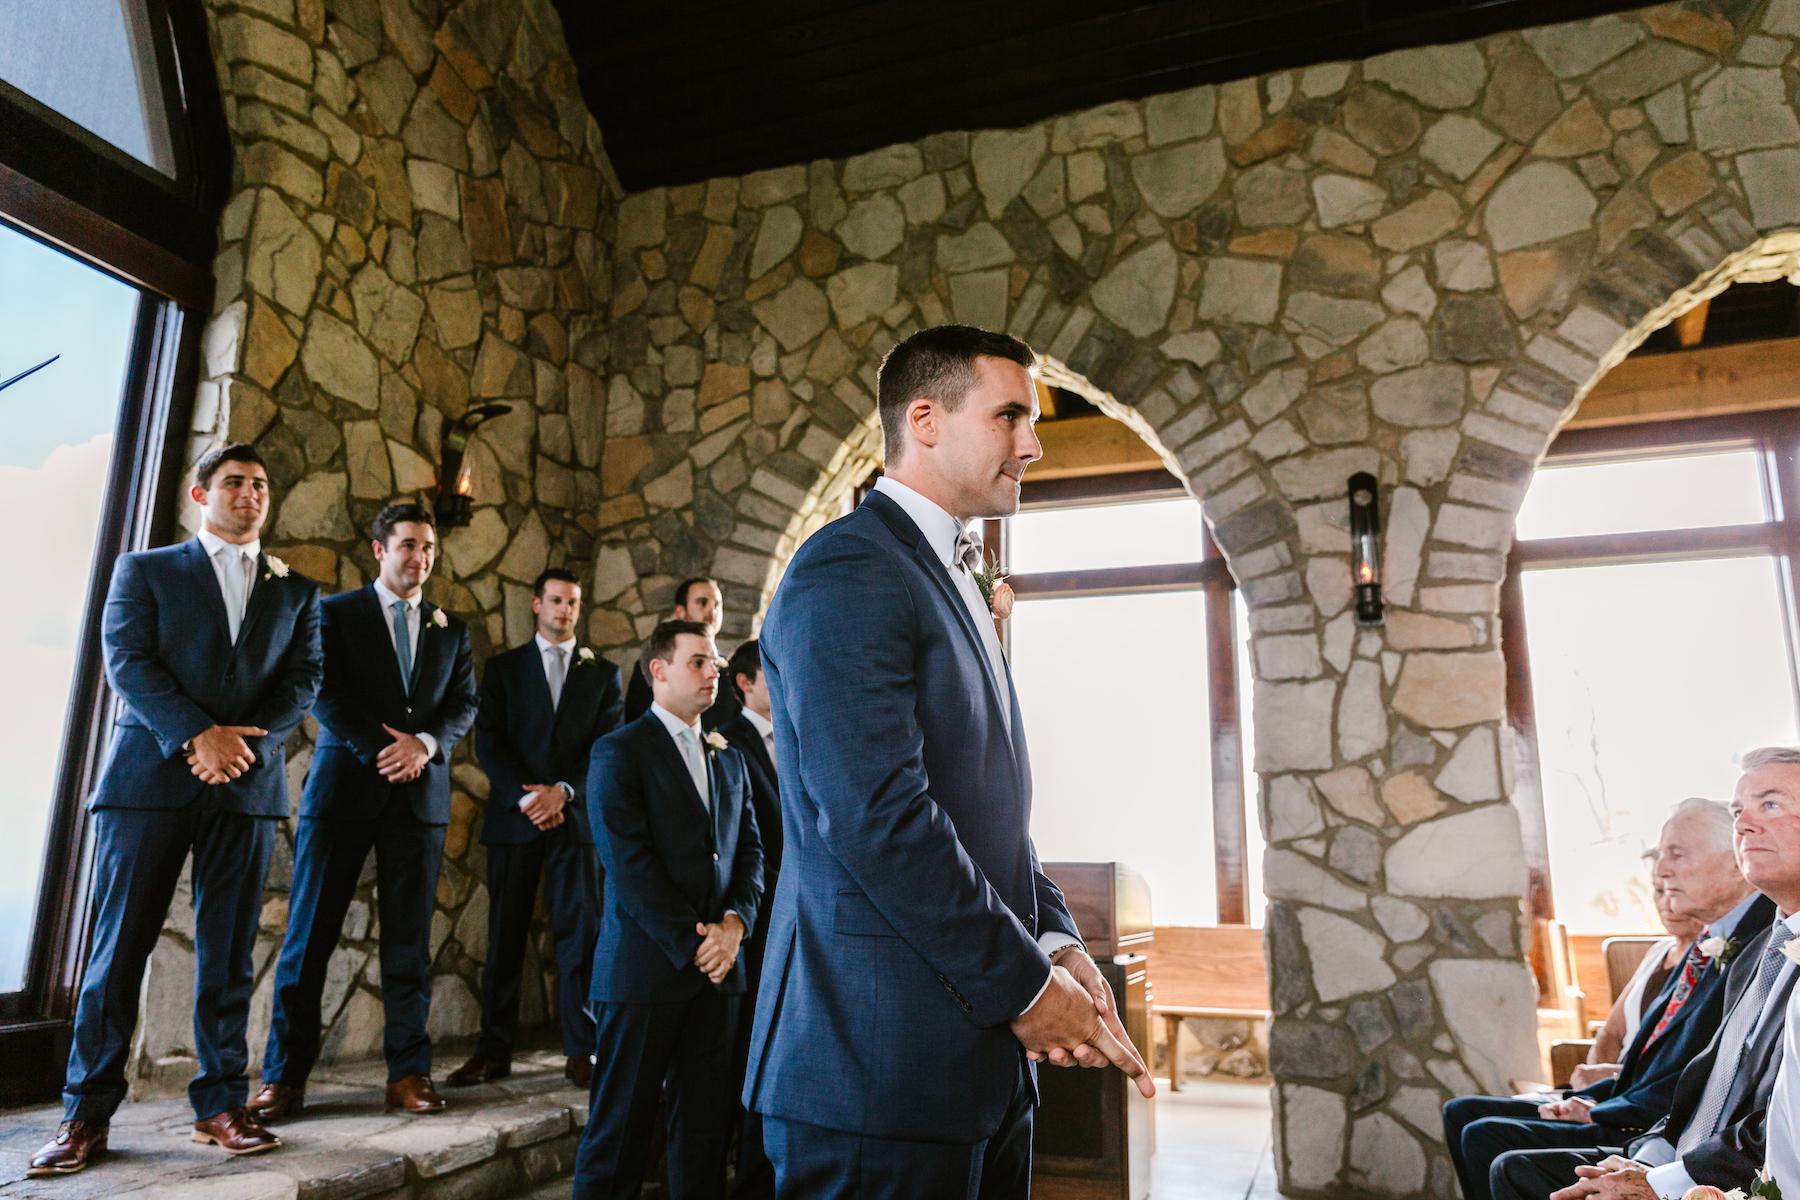 wedding-engagement-photographer-spartanburg-greenville-columbia-carolina-south-north-476.JPG